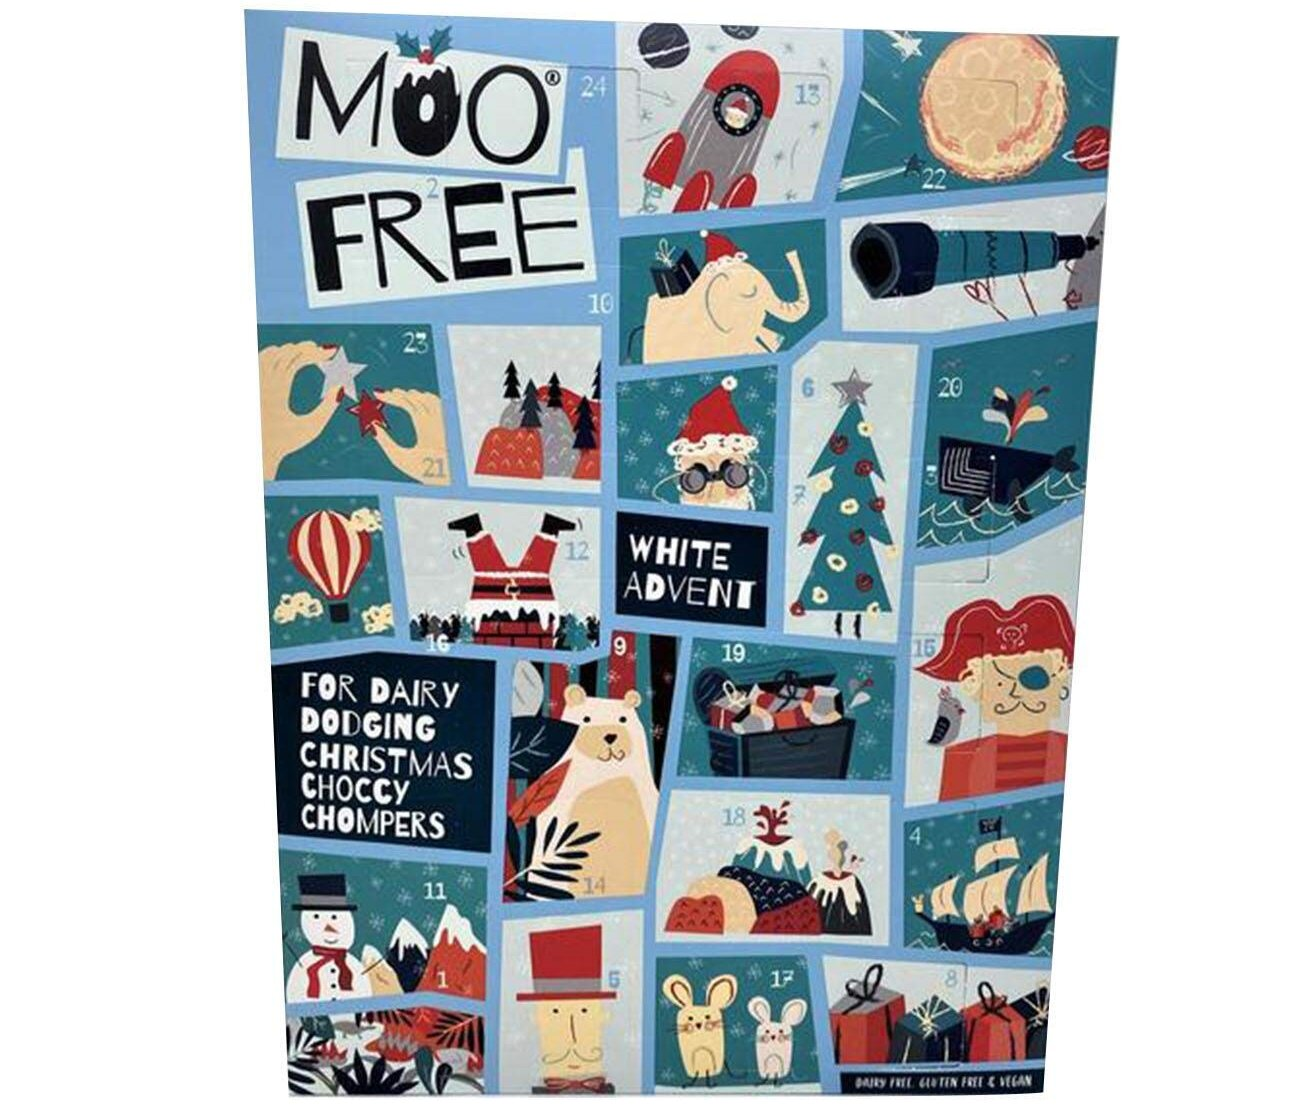 moo free vegan advent calendar